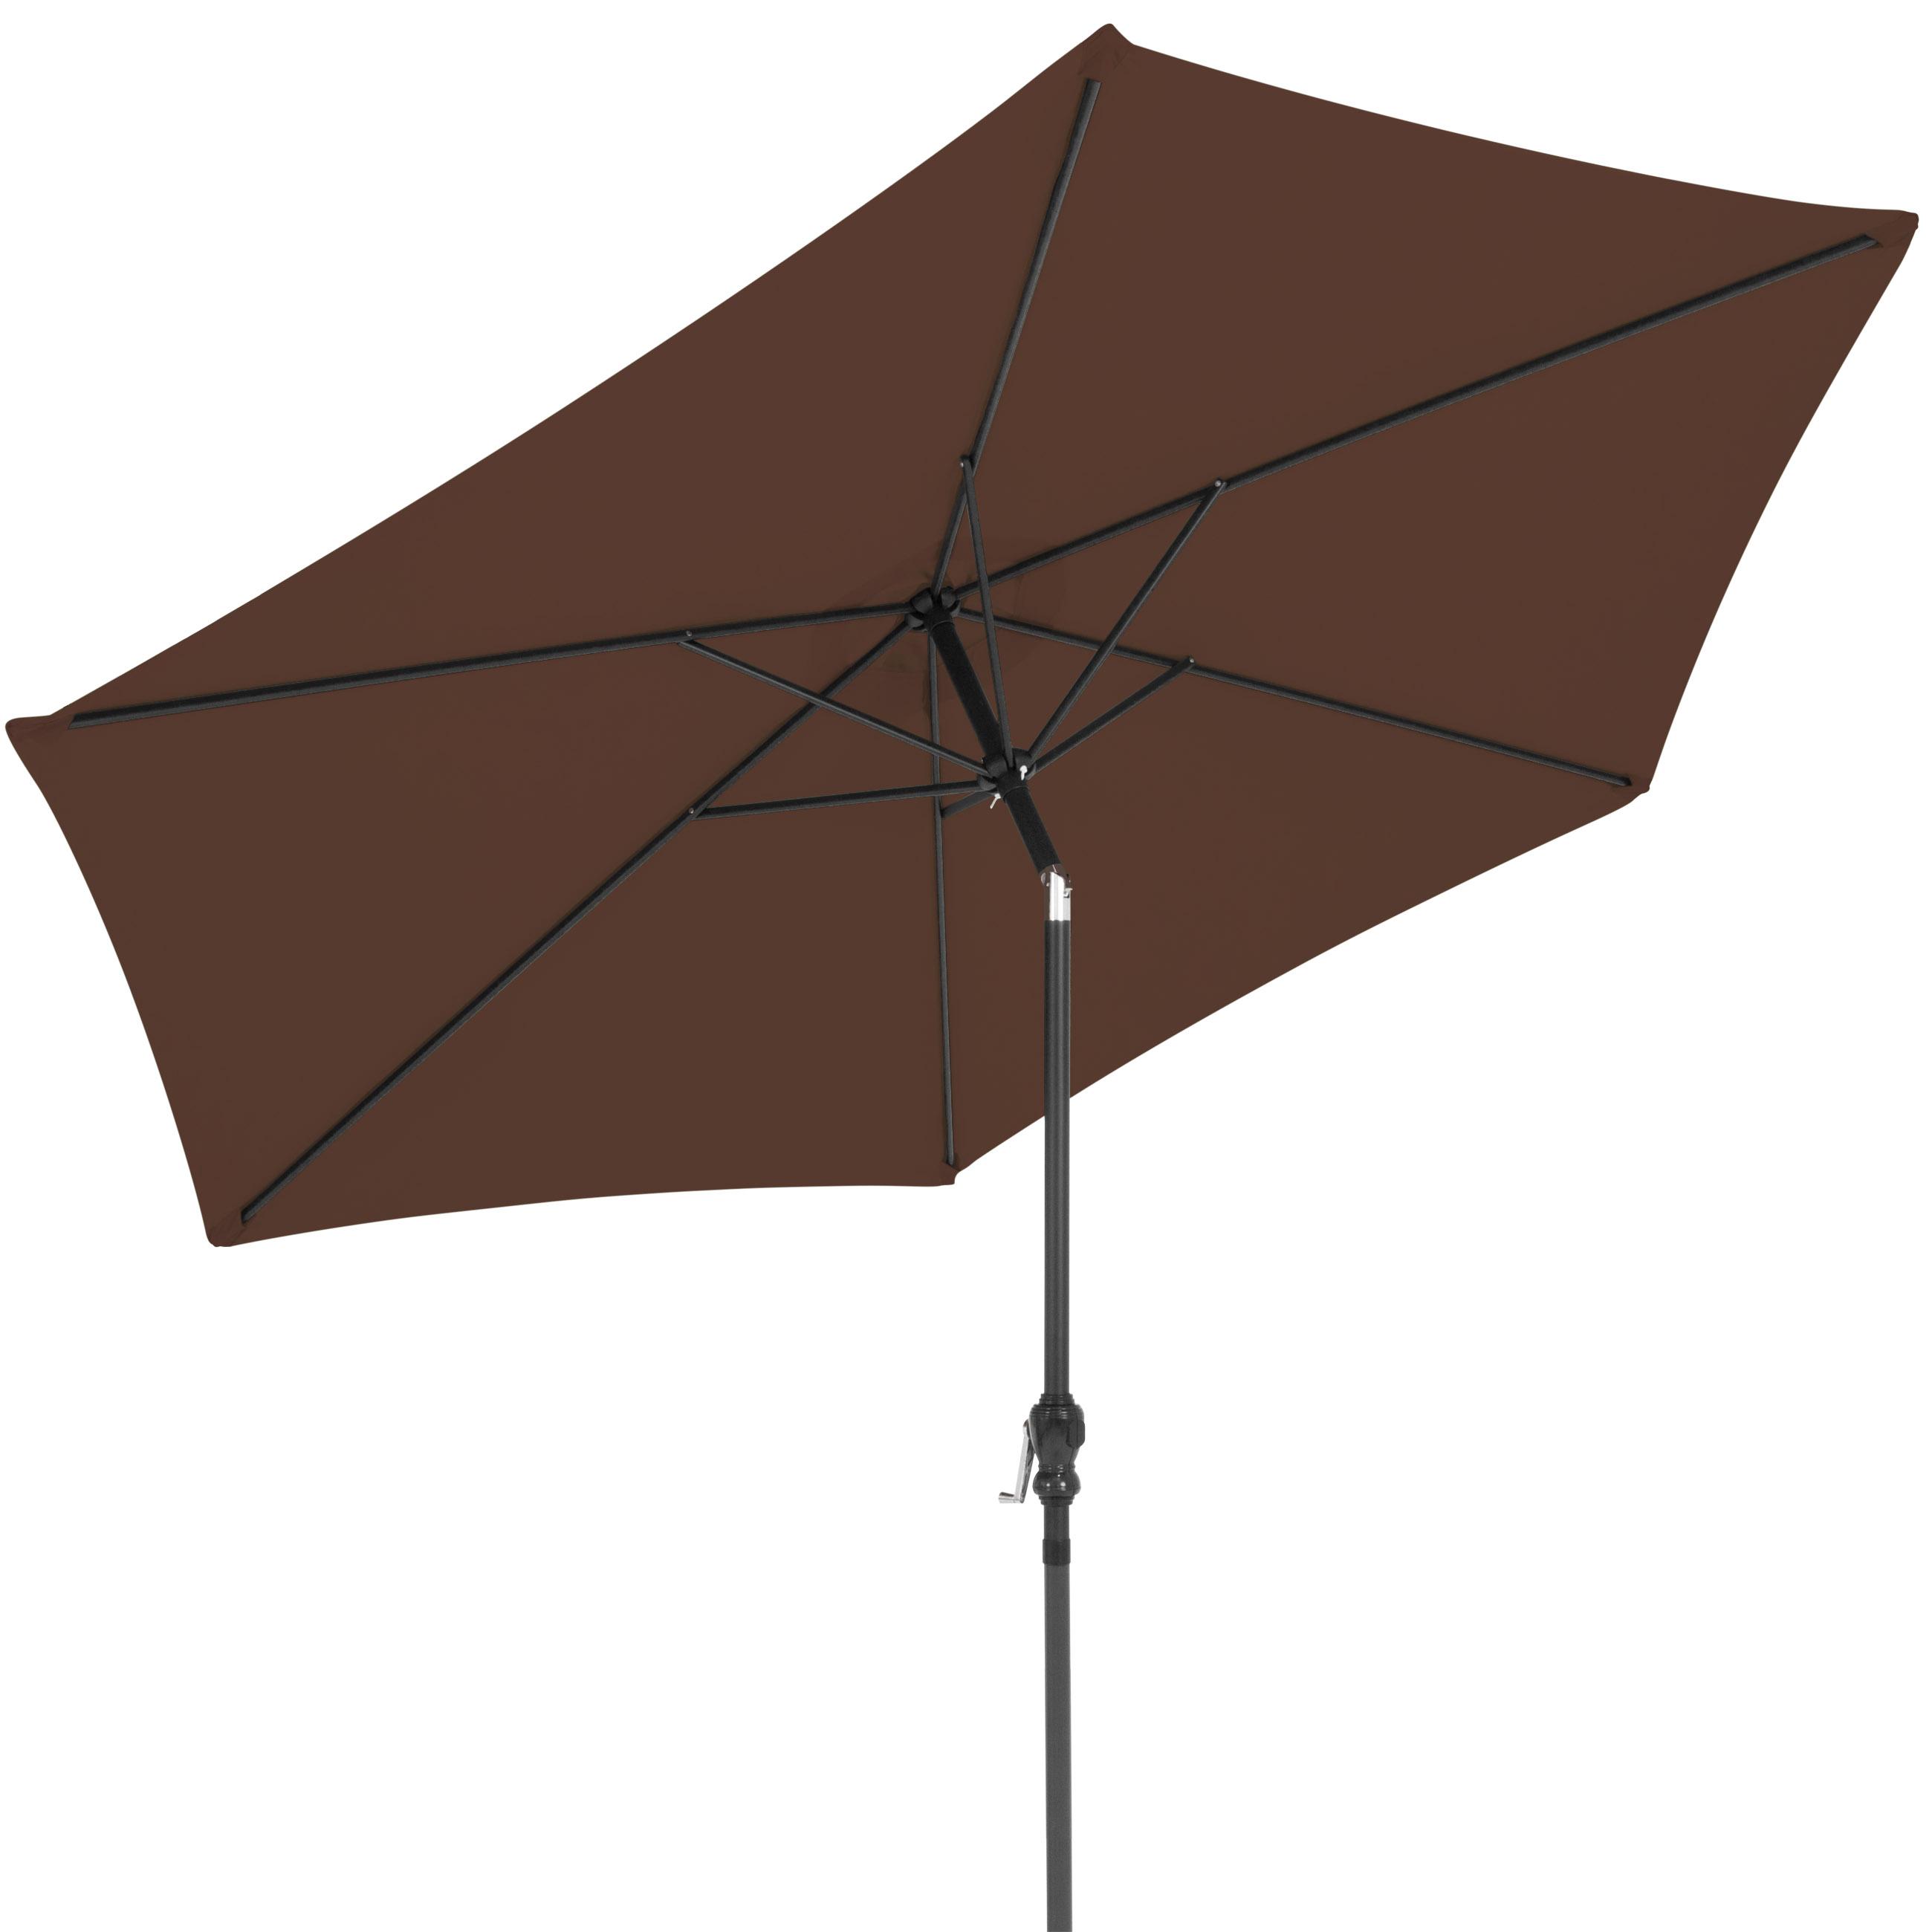 BCP-10ft-Outdoor-Steel-Market-Patio-Umbrella-Decoration-w-Tilt-Crank thumbnail 17